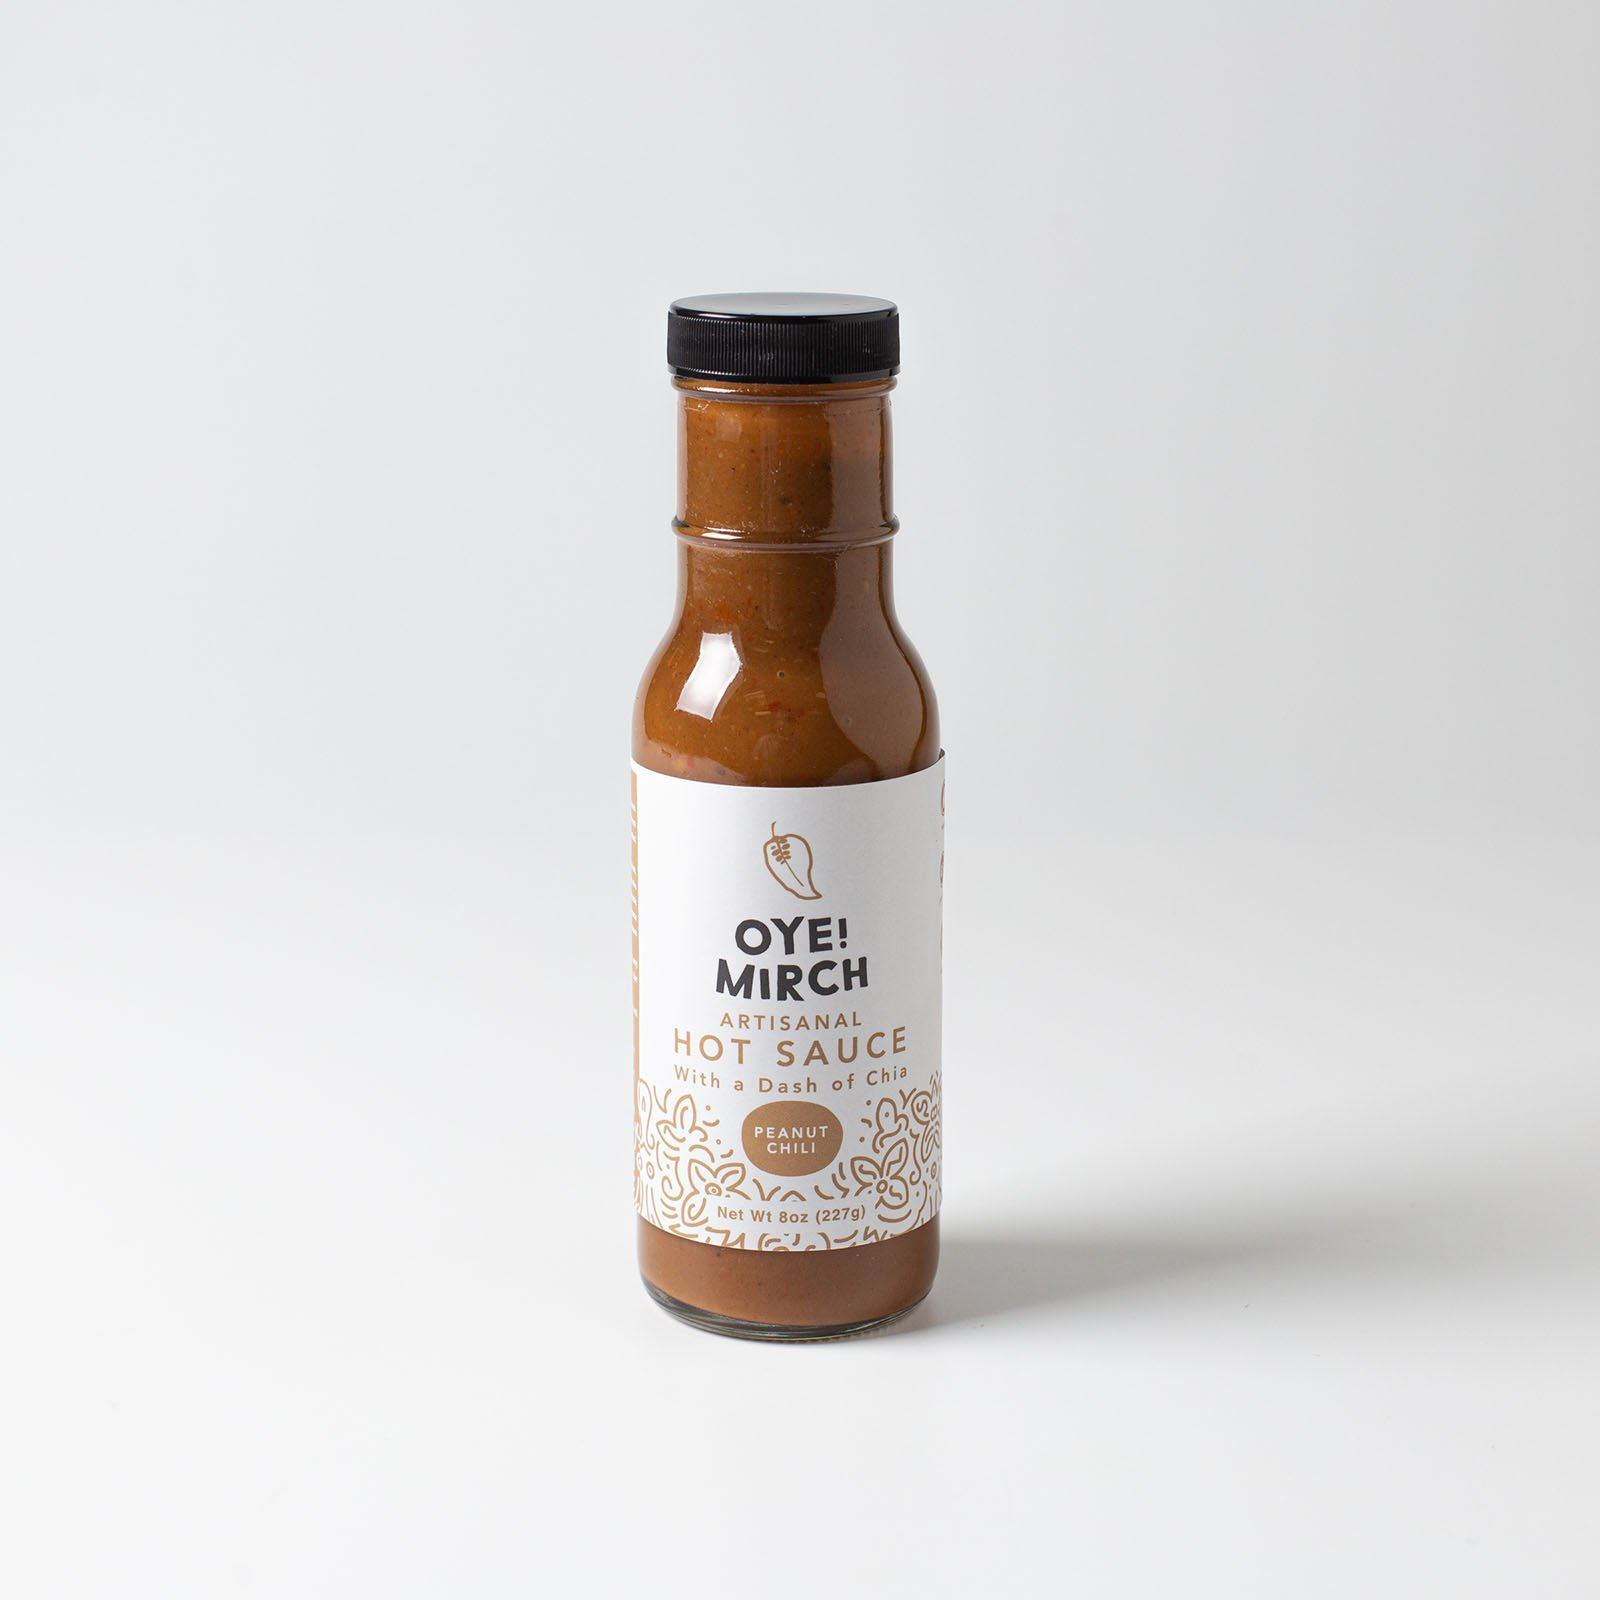 Chili Hot Sauce - Peanut Cocina The Shop